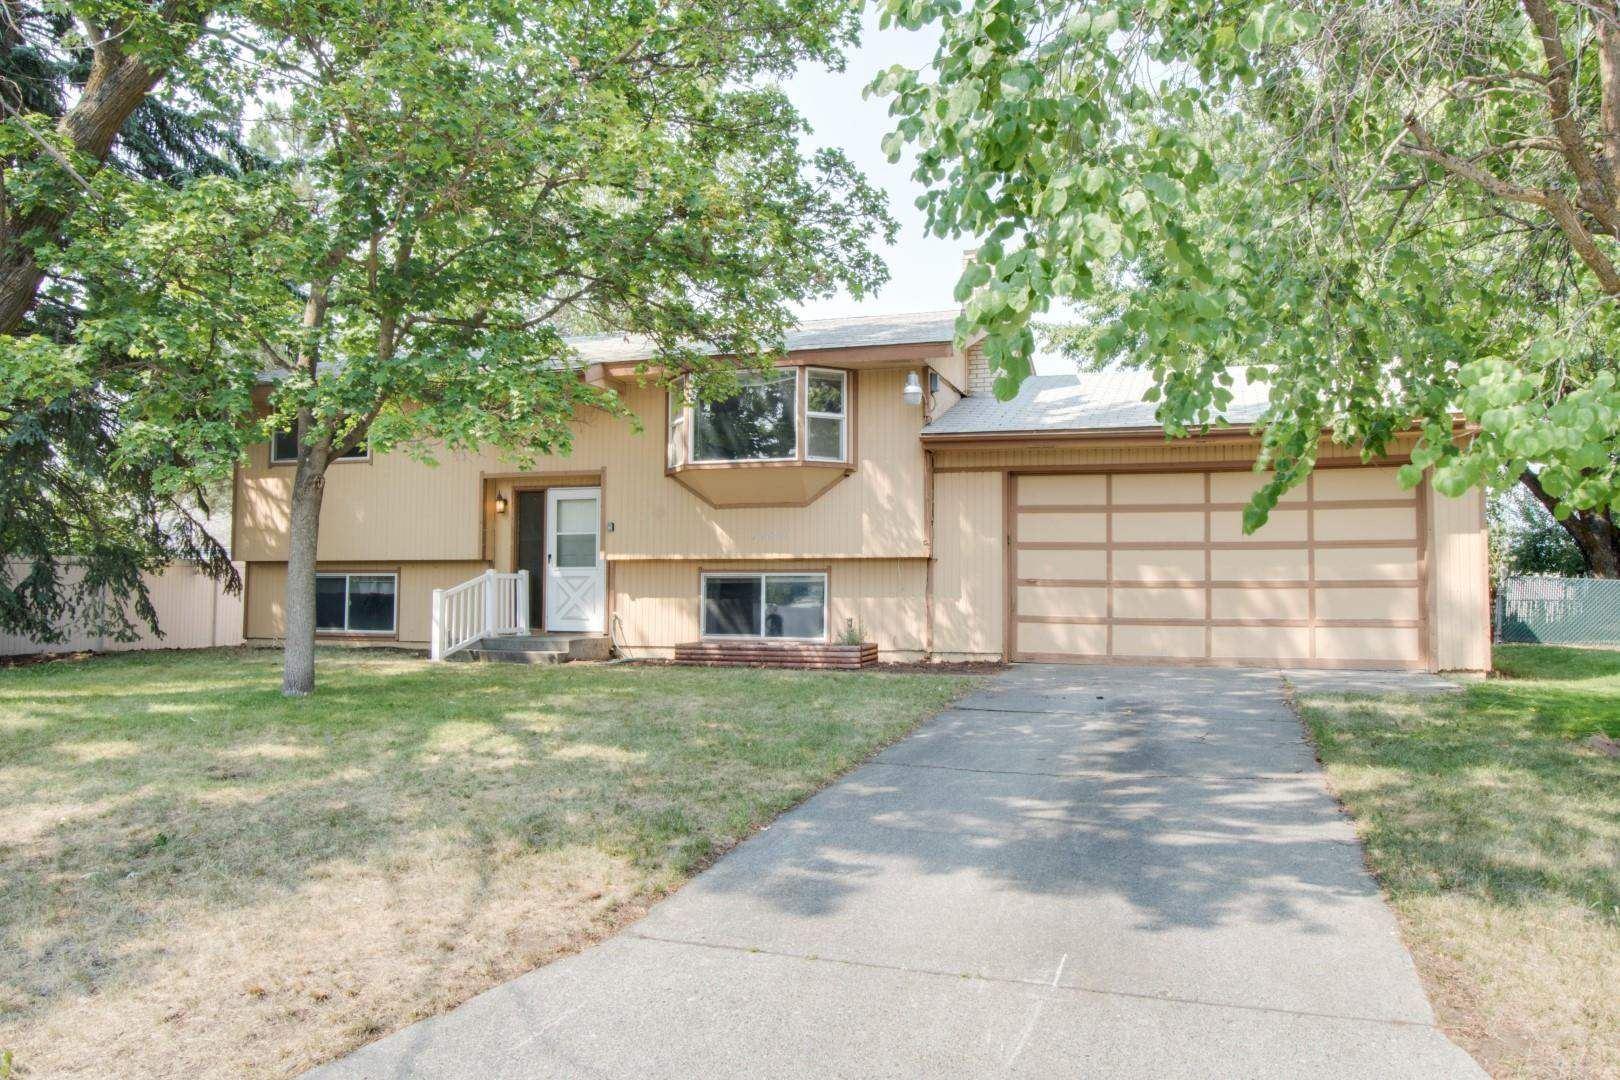 12803 E Sharp Ave, Spokane Valley, WA 99216-1019 - #: 202120065